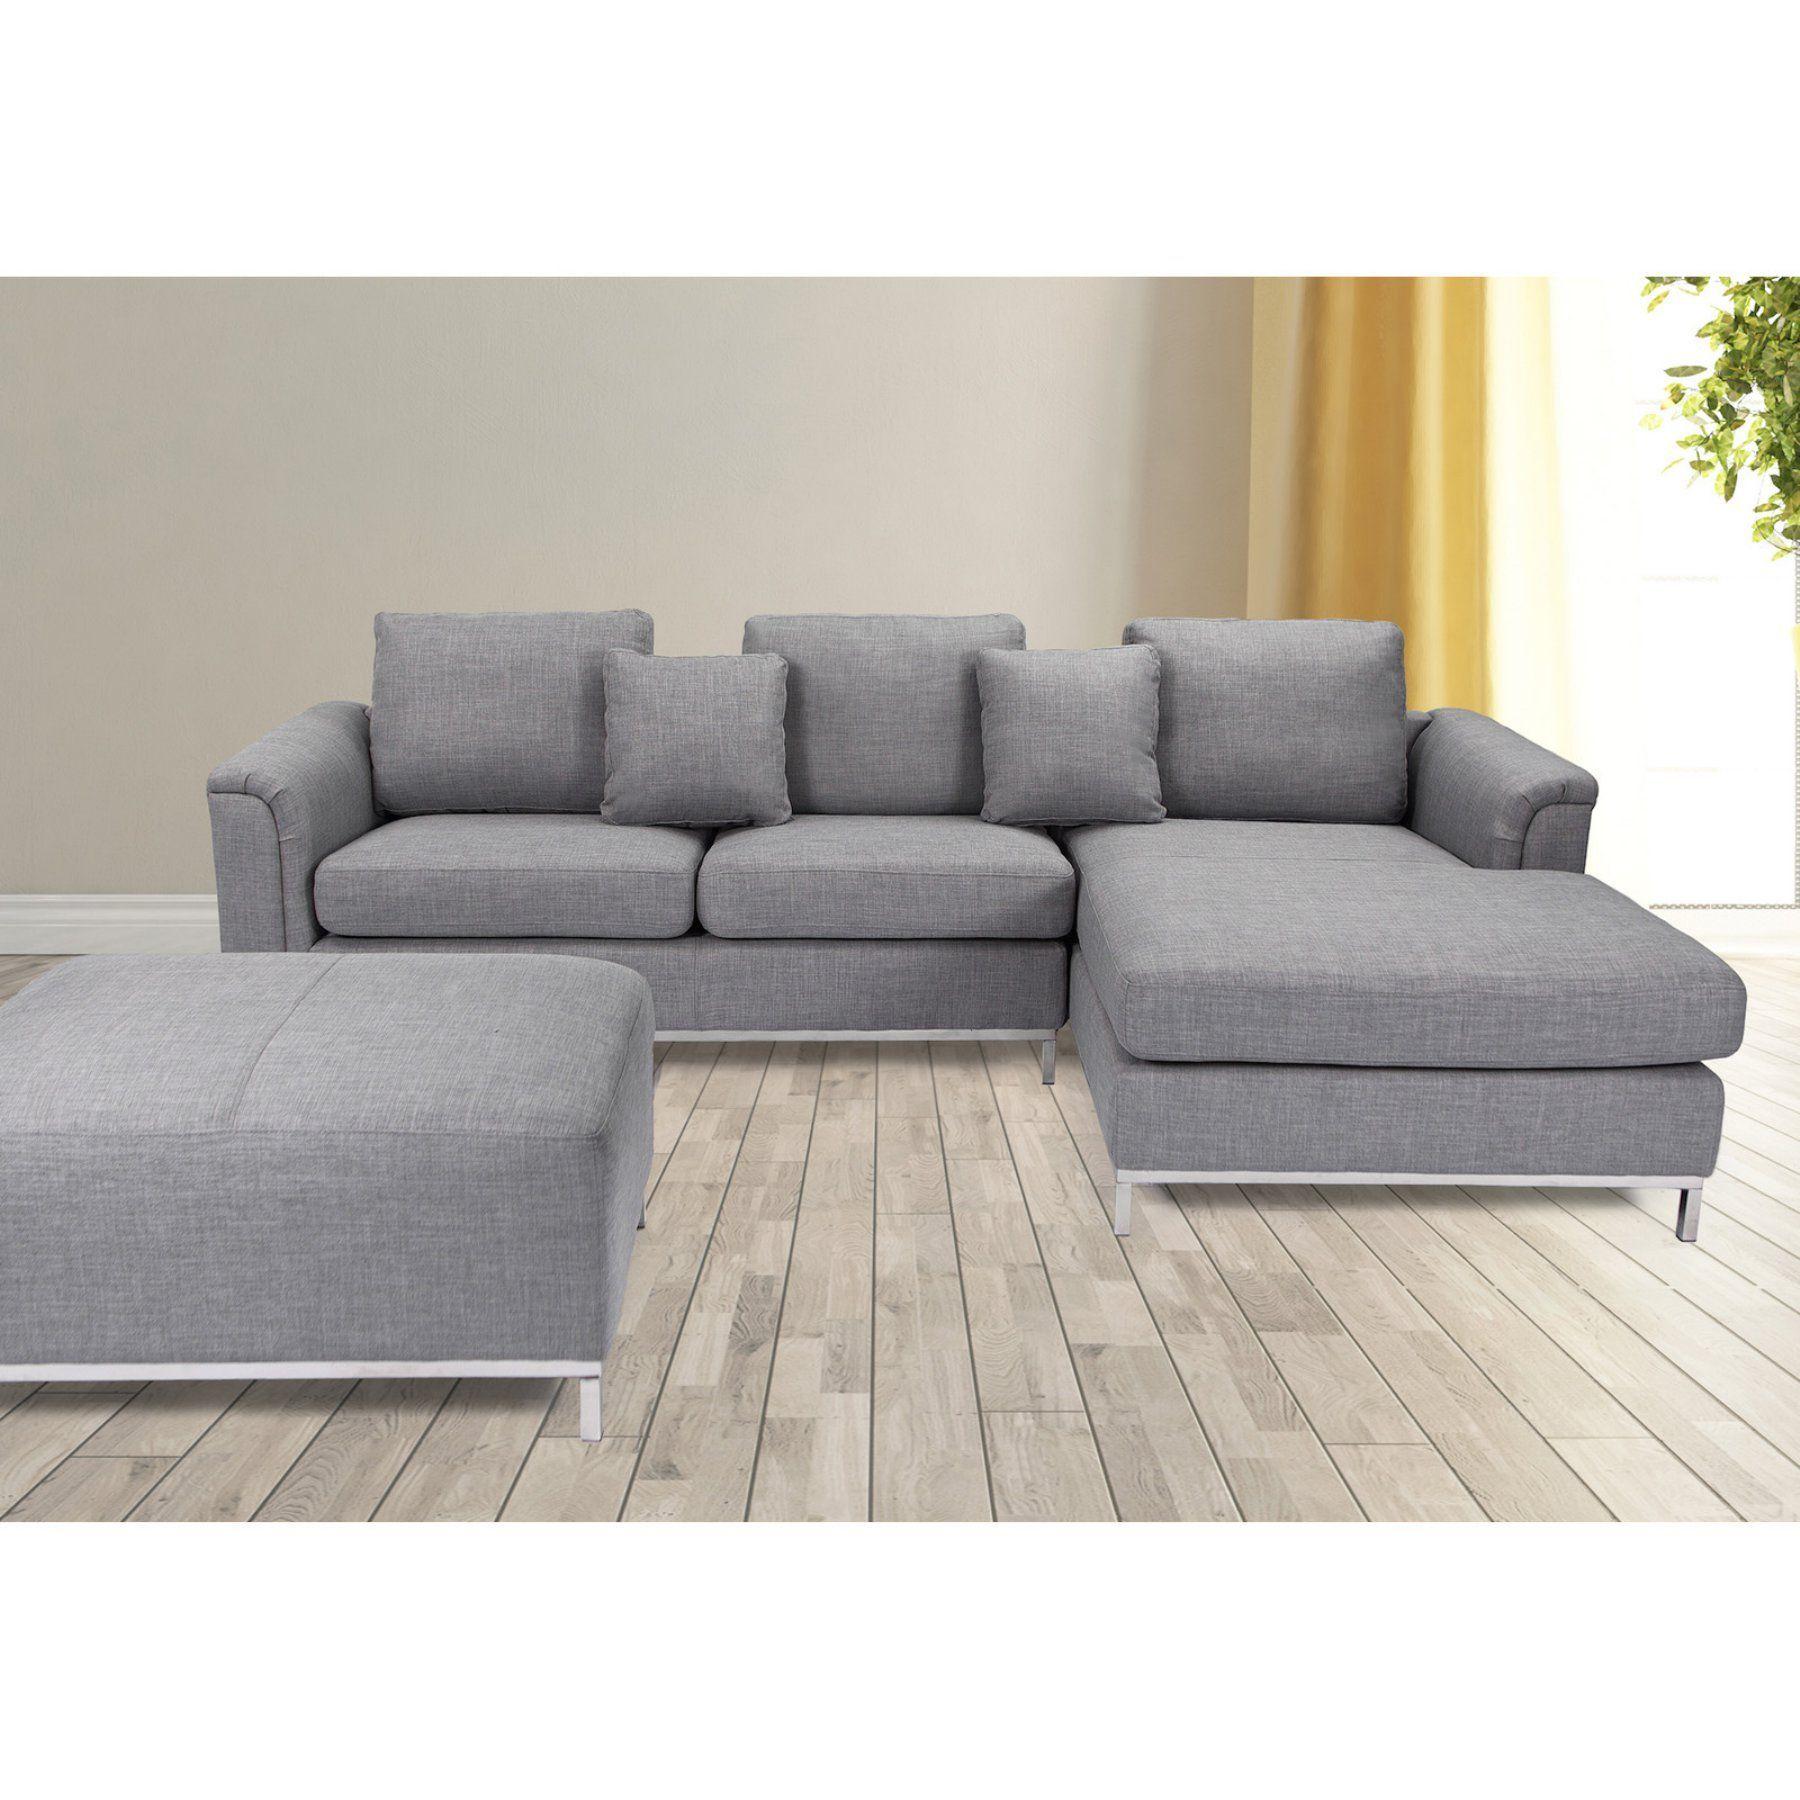 Fabric Sectional Sofa With Ottoman